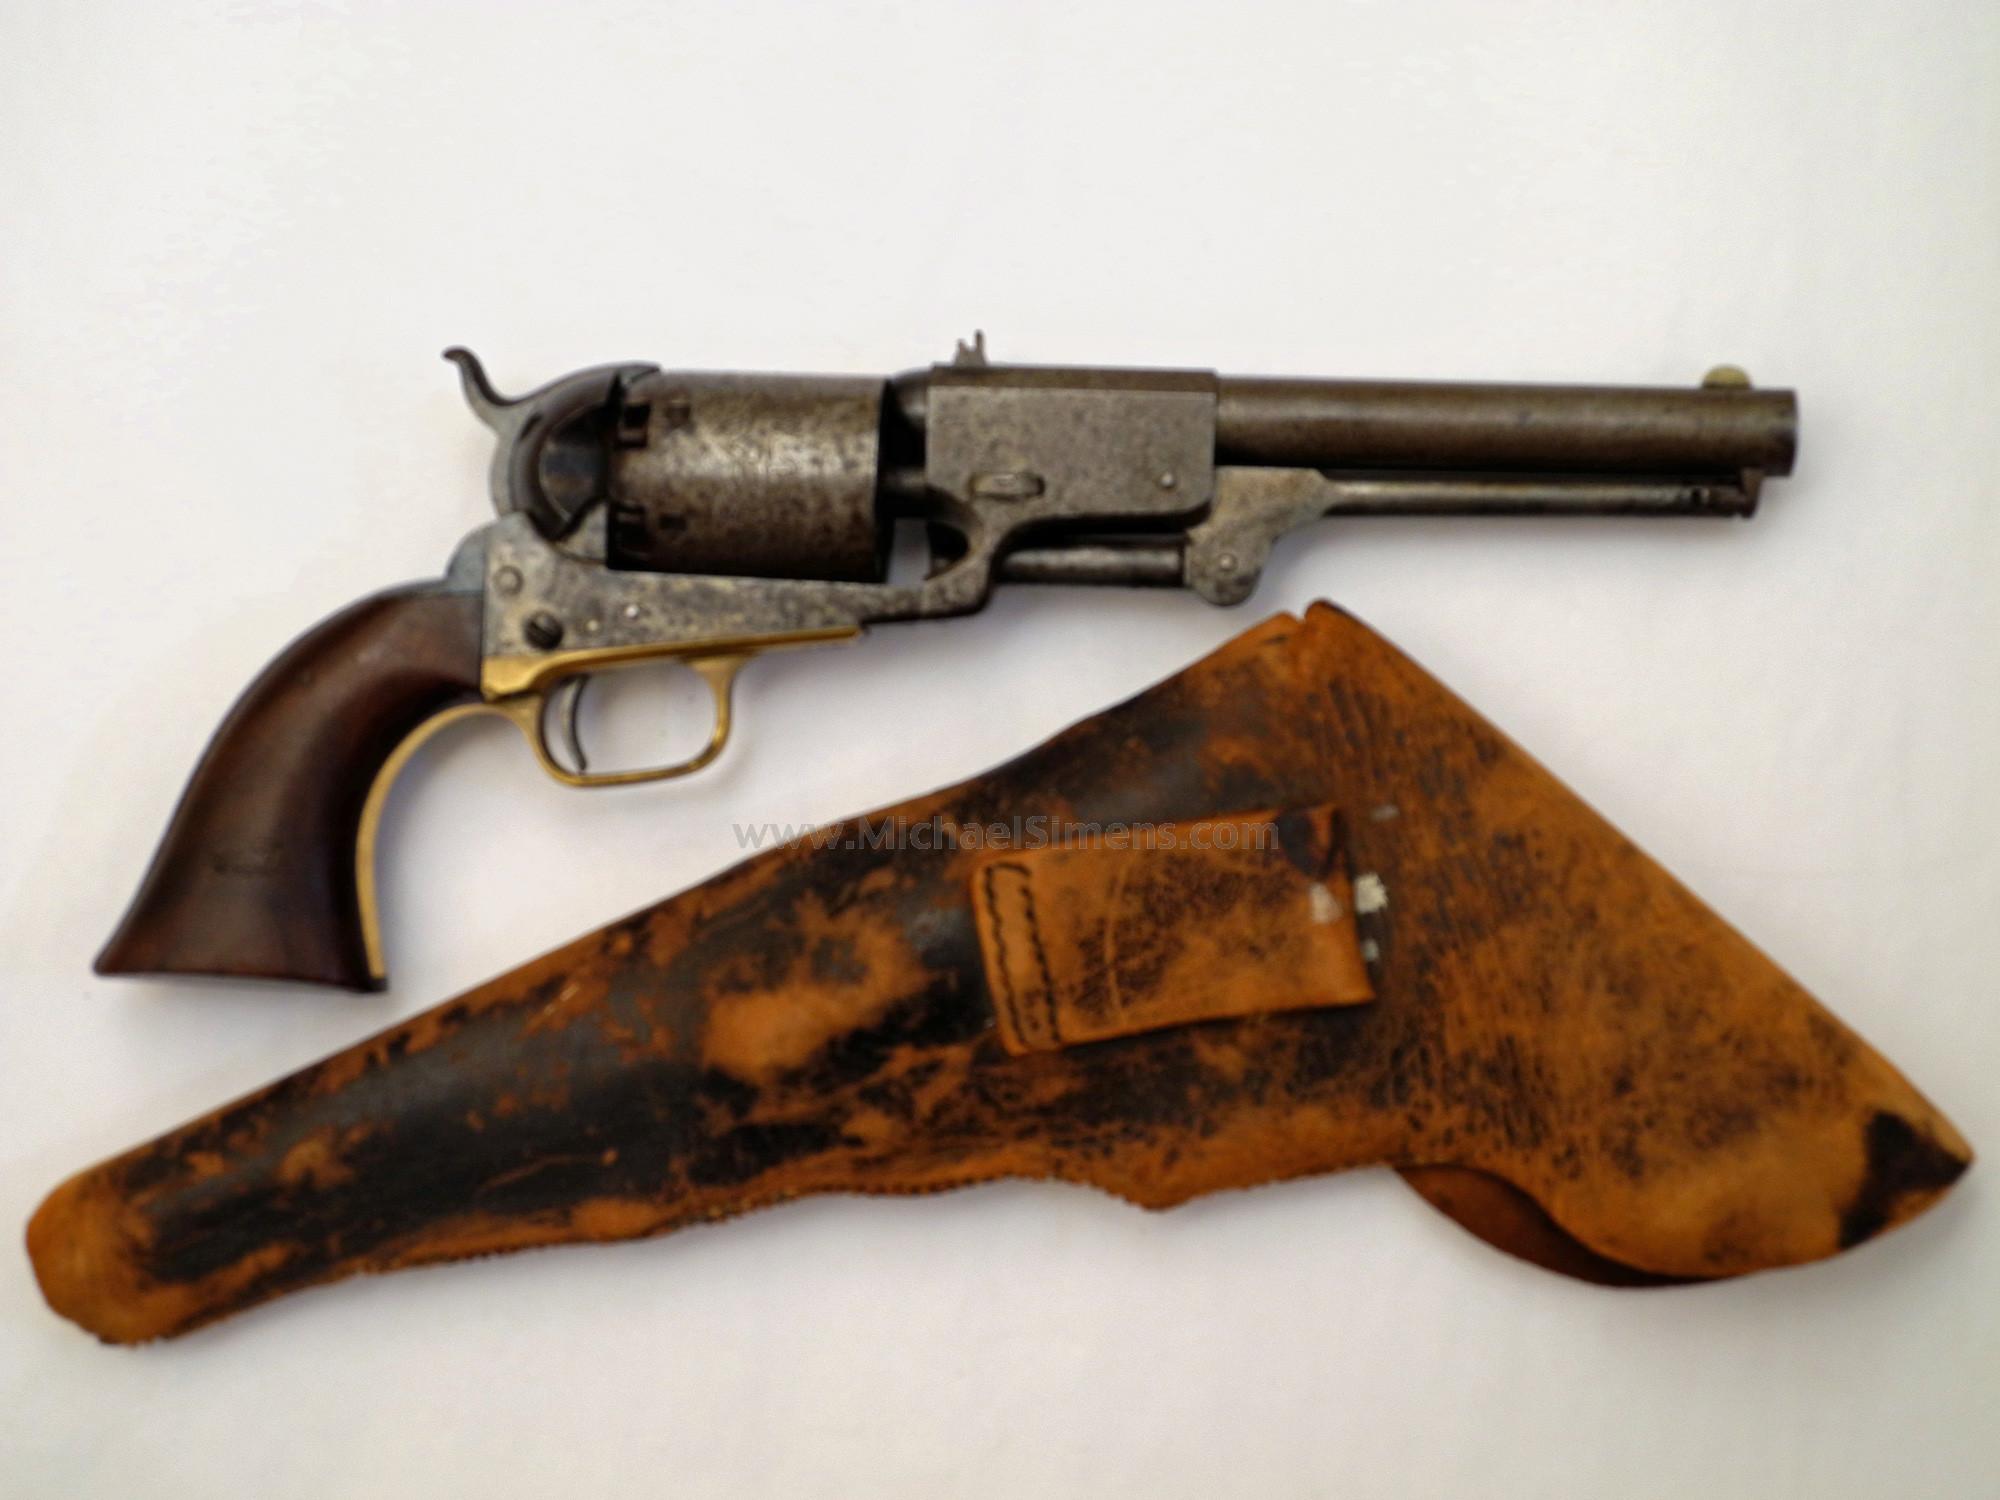 Antique Colt Dragoon Revolver, 4-Screw Cut for Stock, Civil